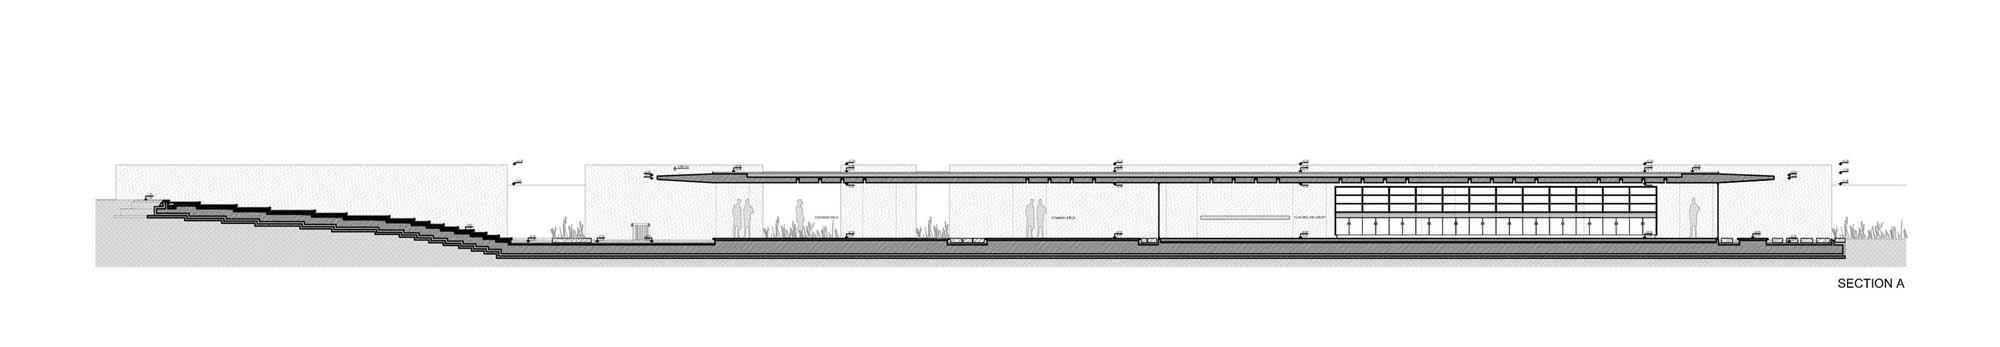 16-Emre-Arolat-Architects-Sancaklar-Mosque